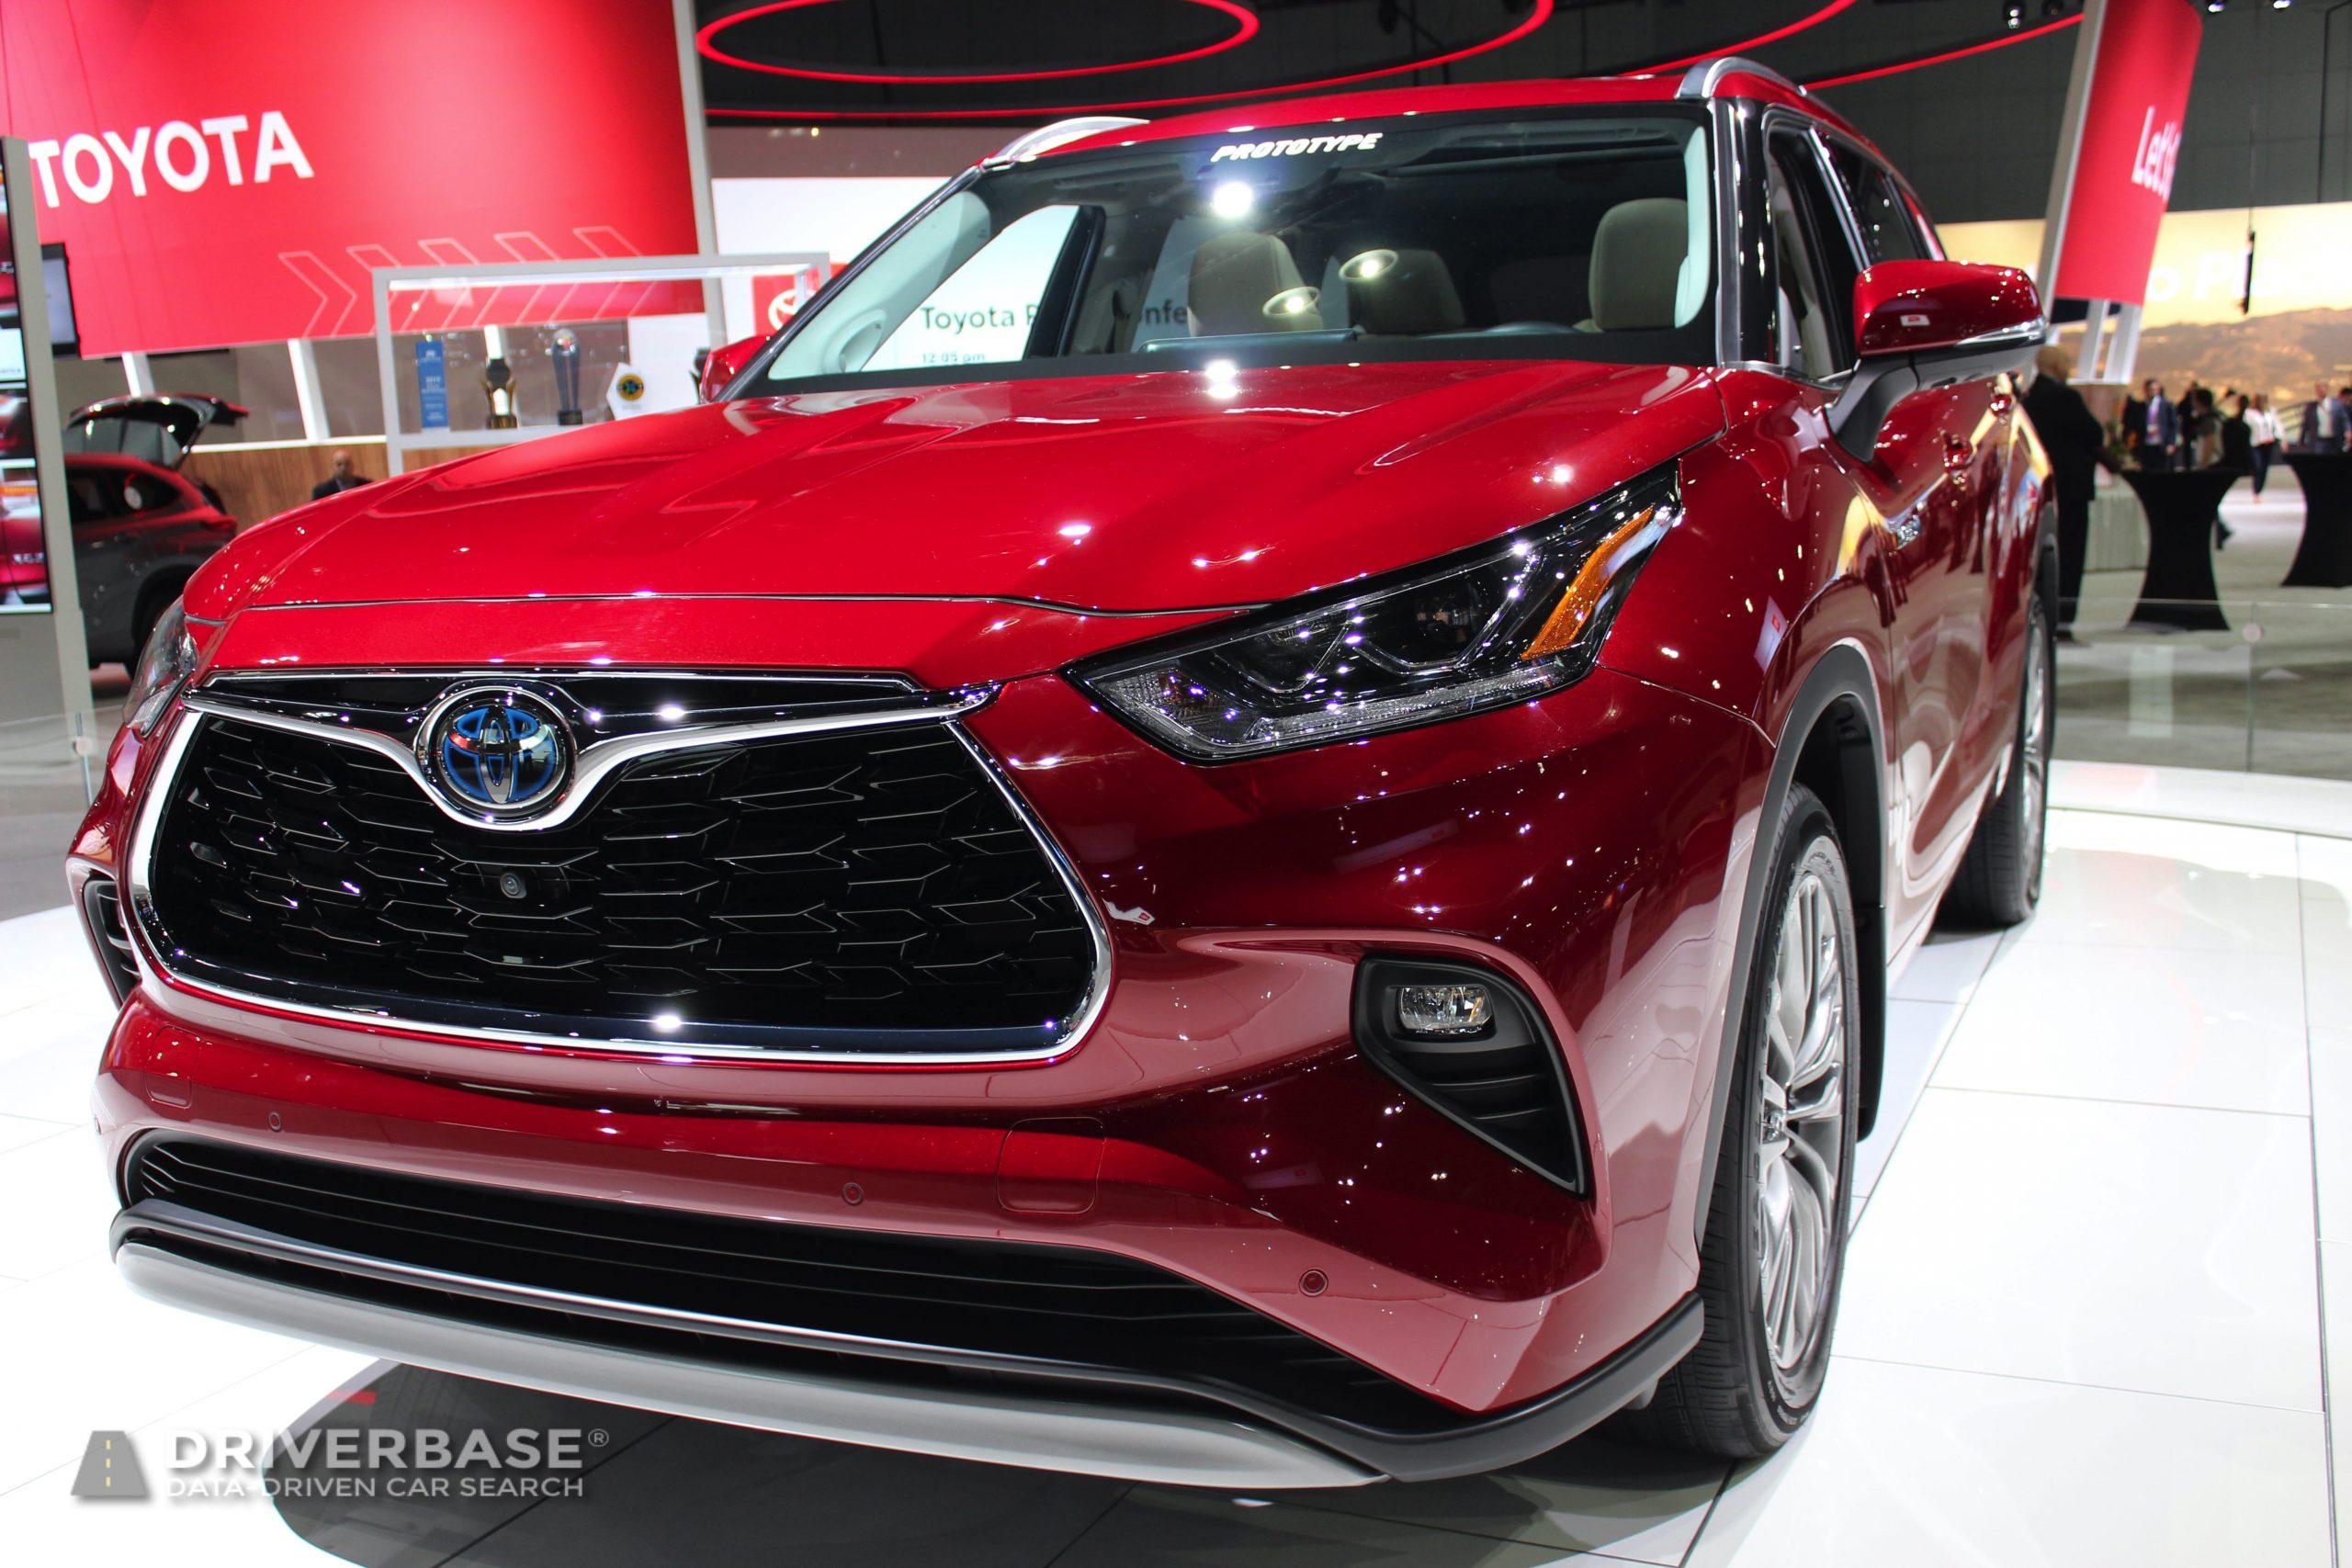 2020 Toyota Highlander Hybrid at the 2019 Los Angeles Auto Show